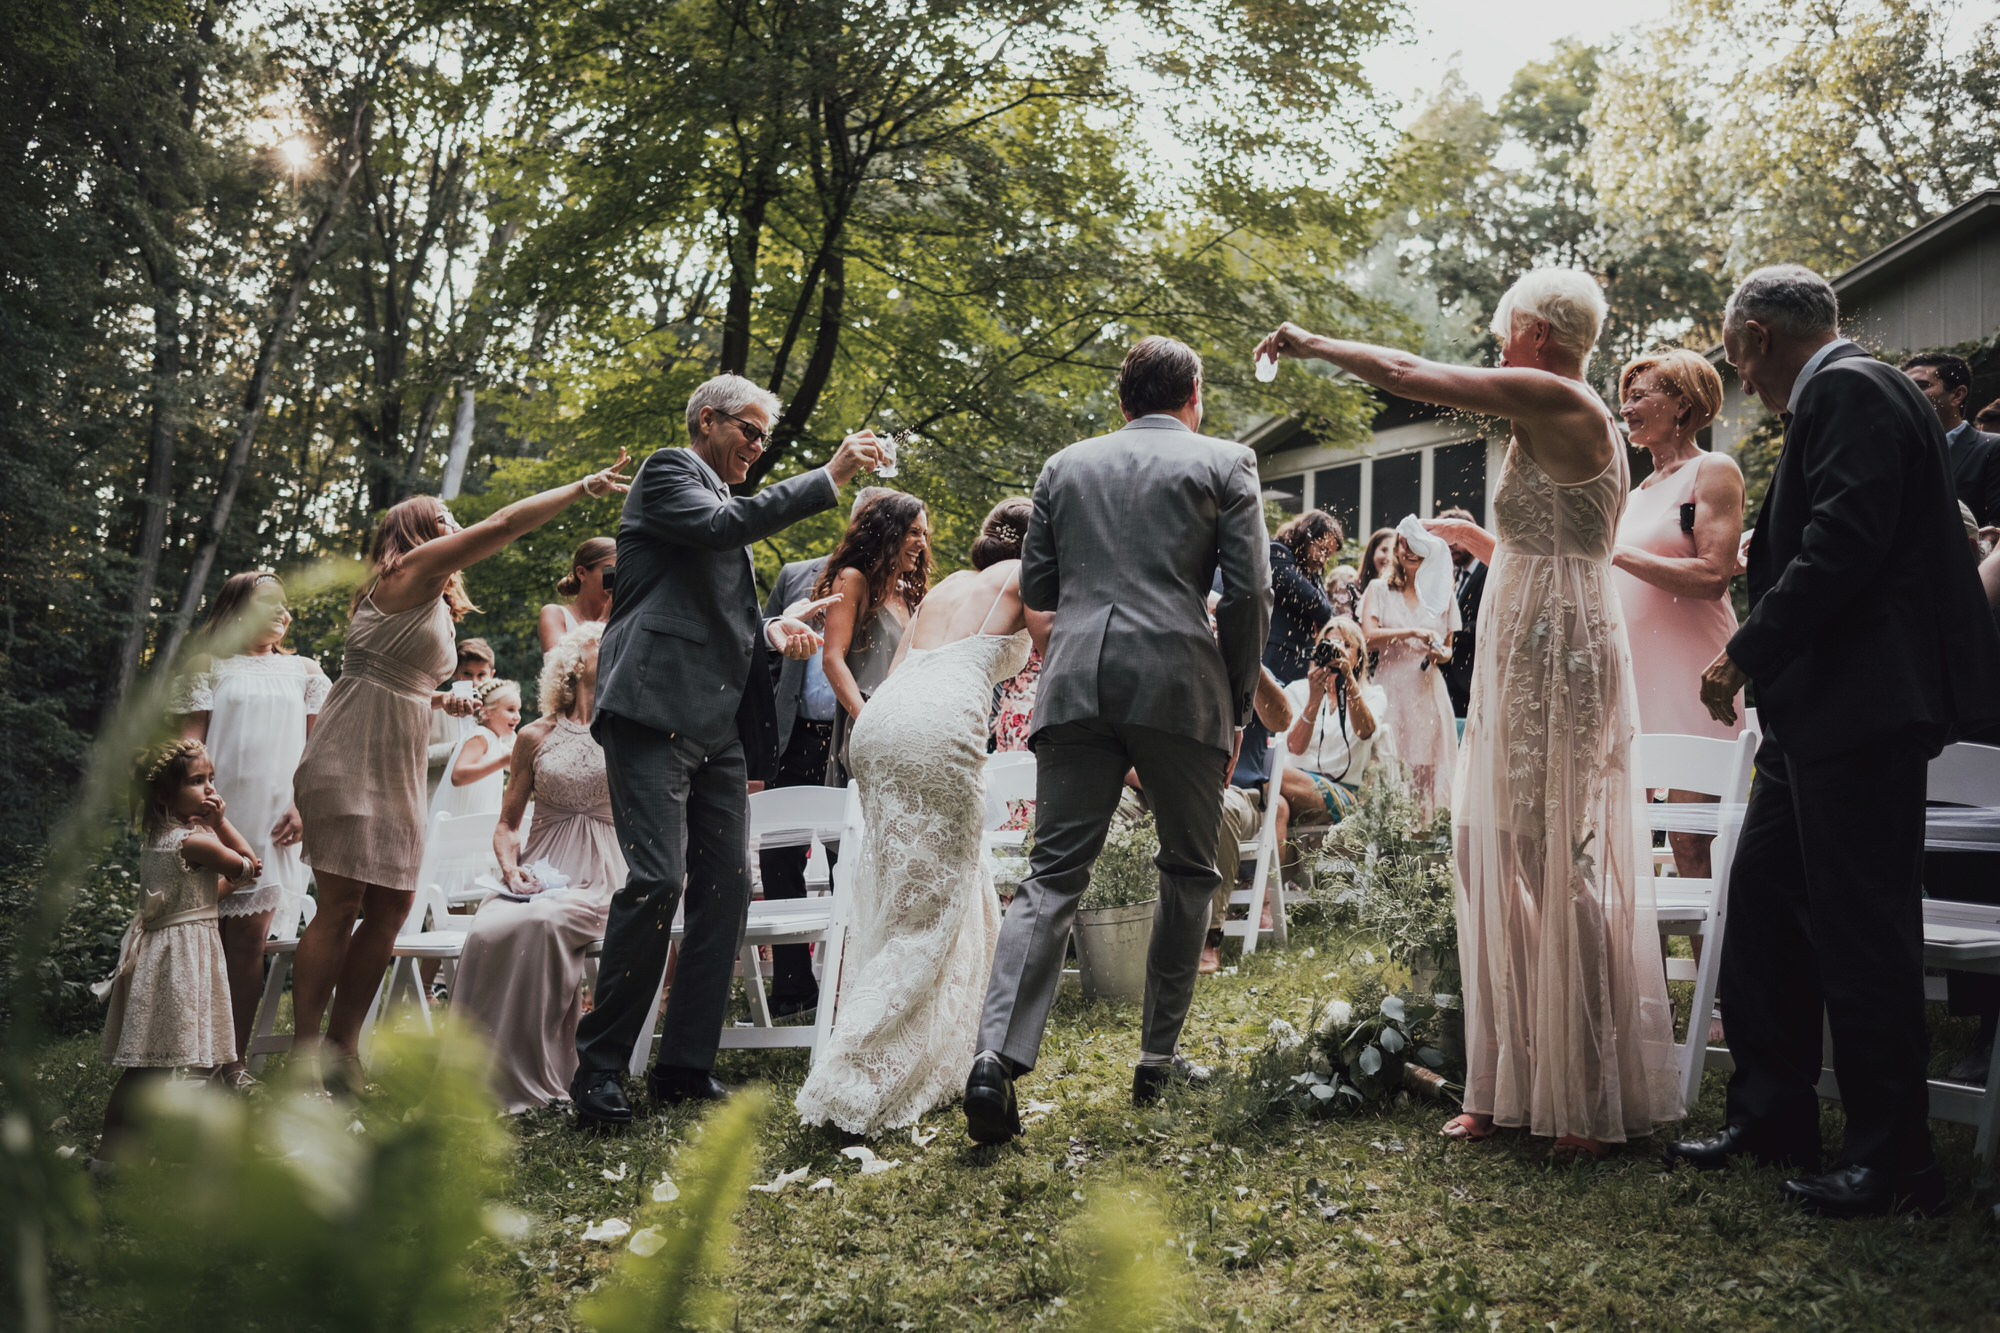 emily-aaron-rochester-new-york-wedding-photographer-157.JPG